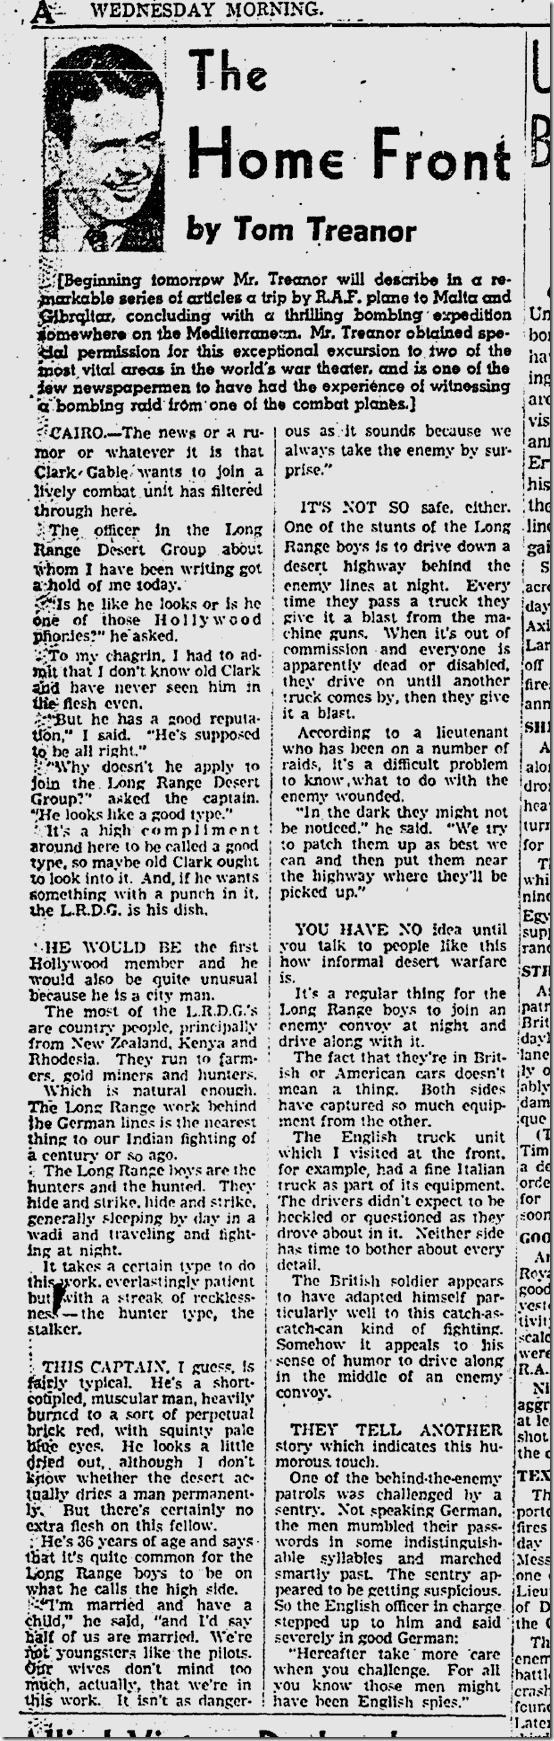 Sept. 9, 1942, Tom Treanor